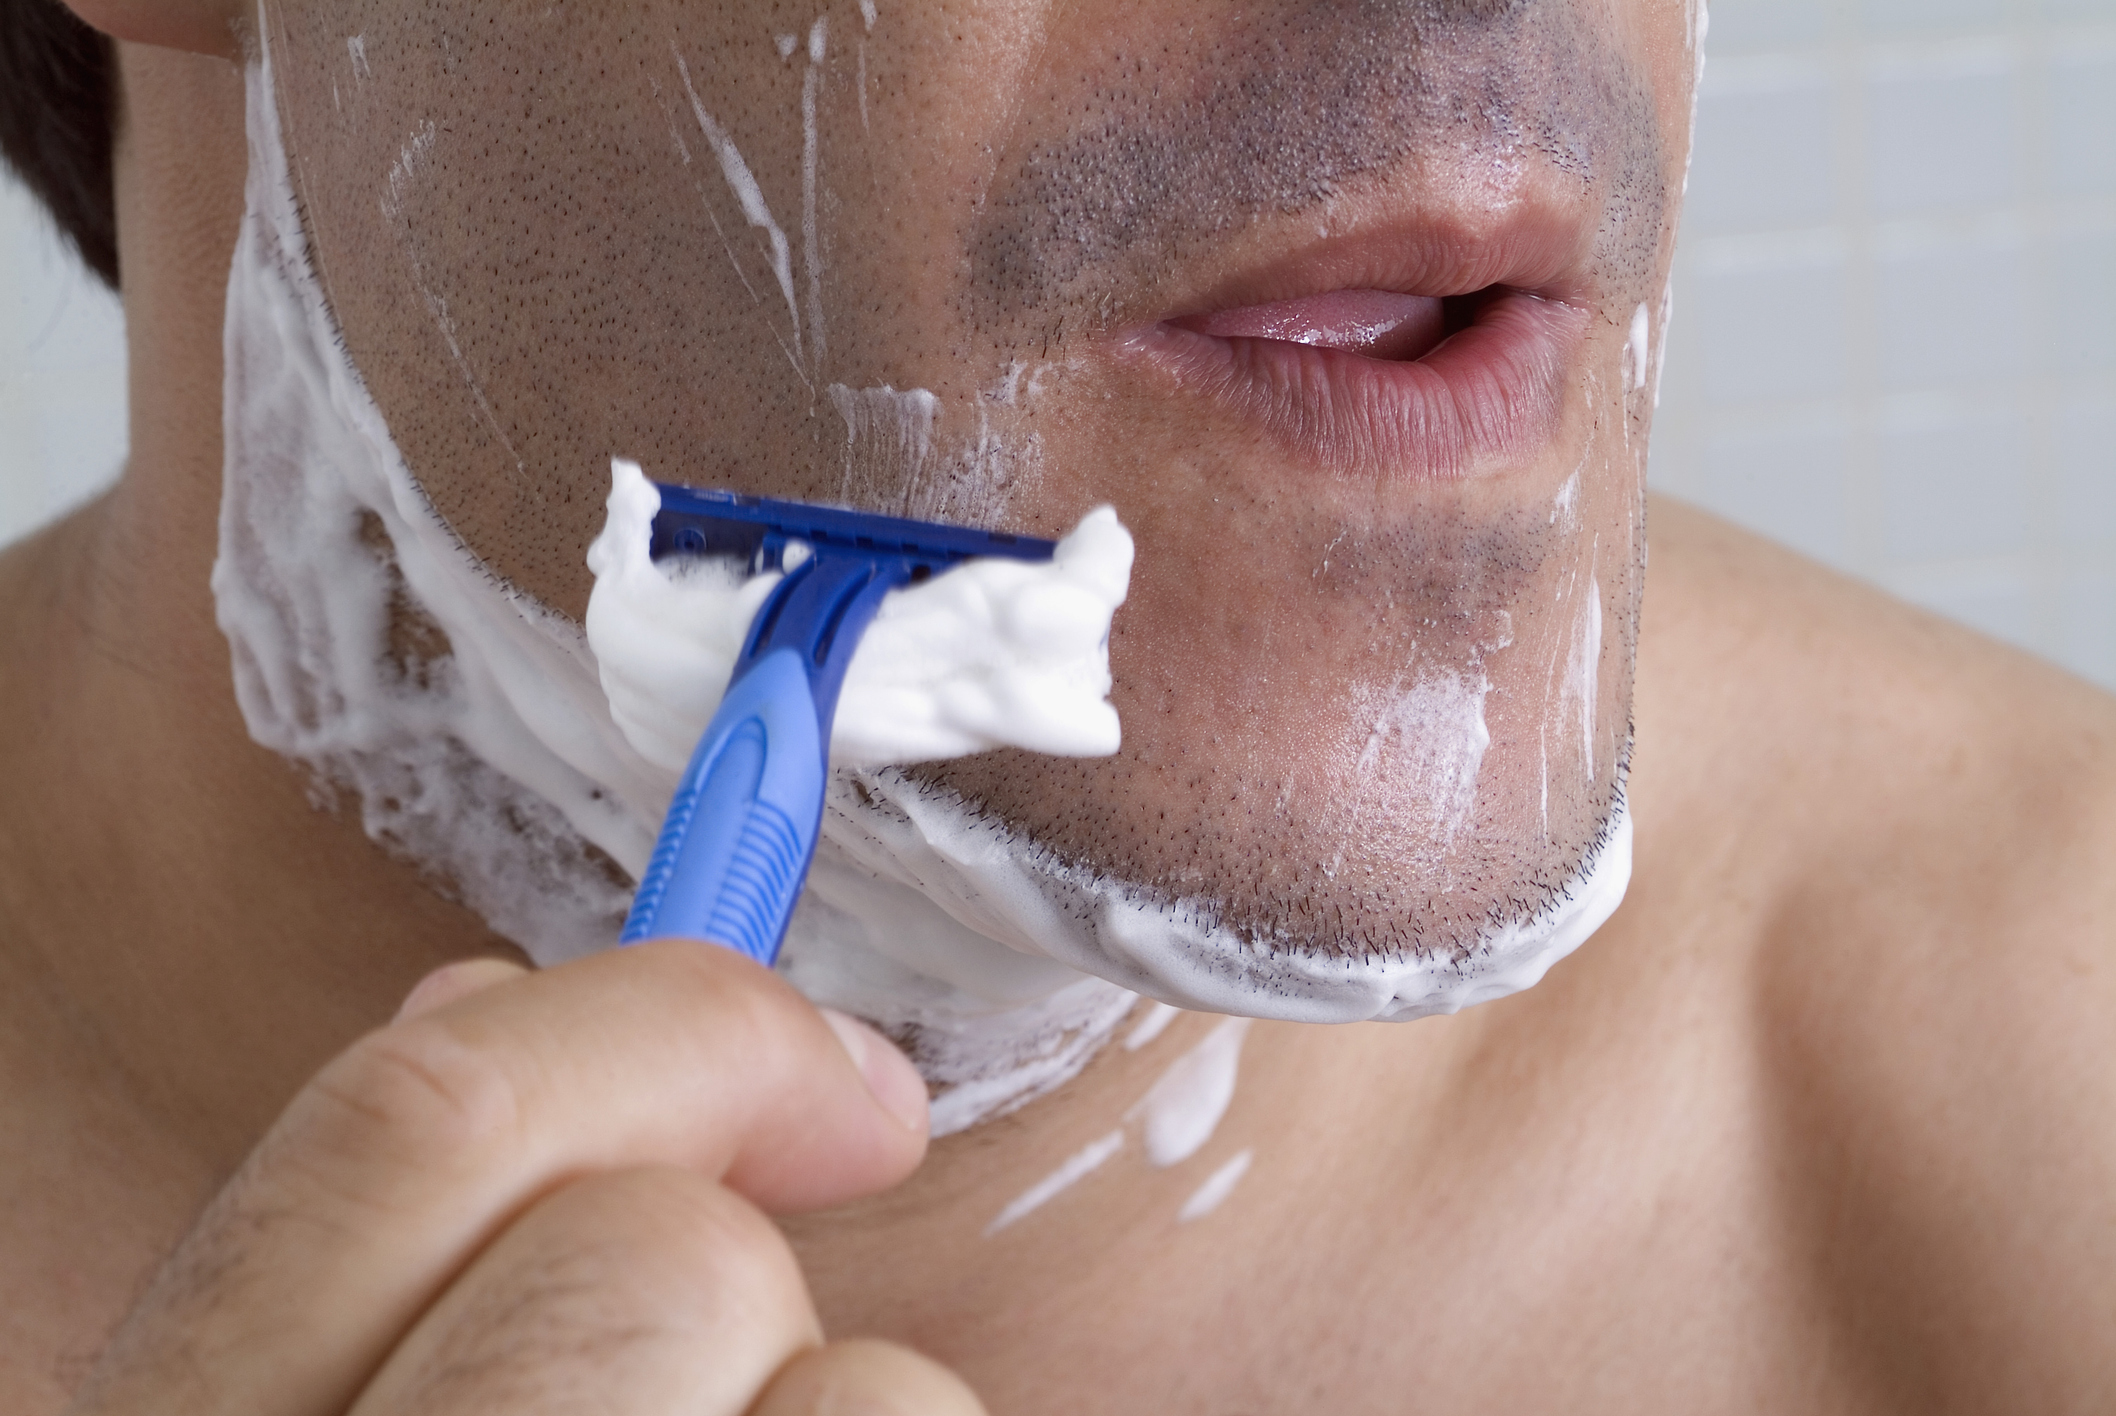 Extreme close-up of man shaving